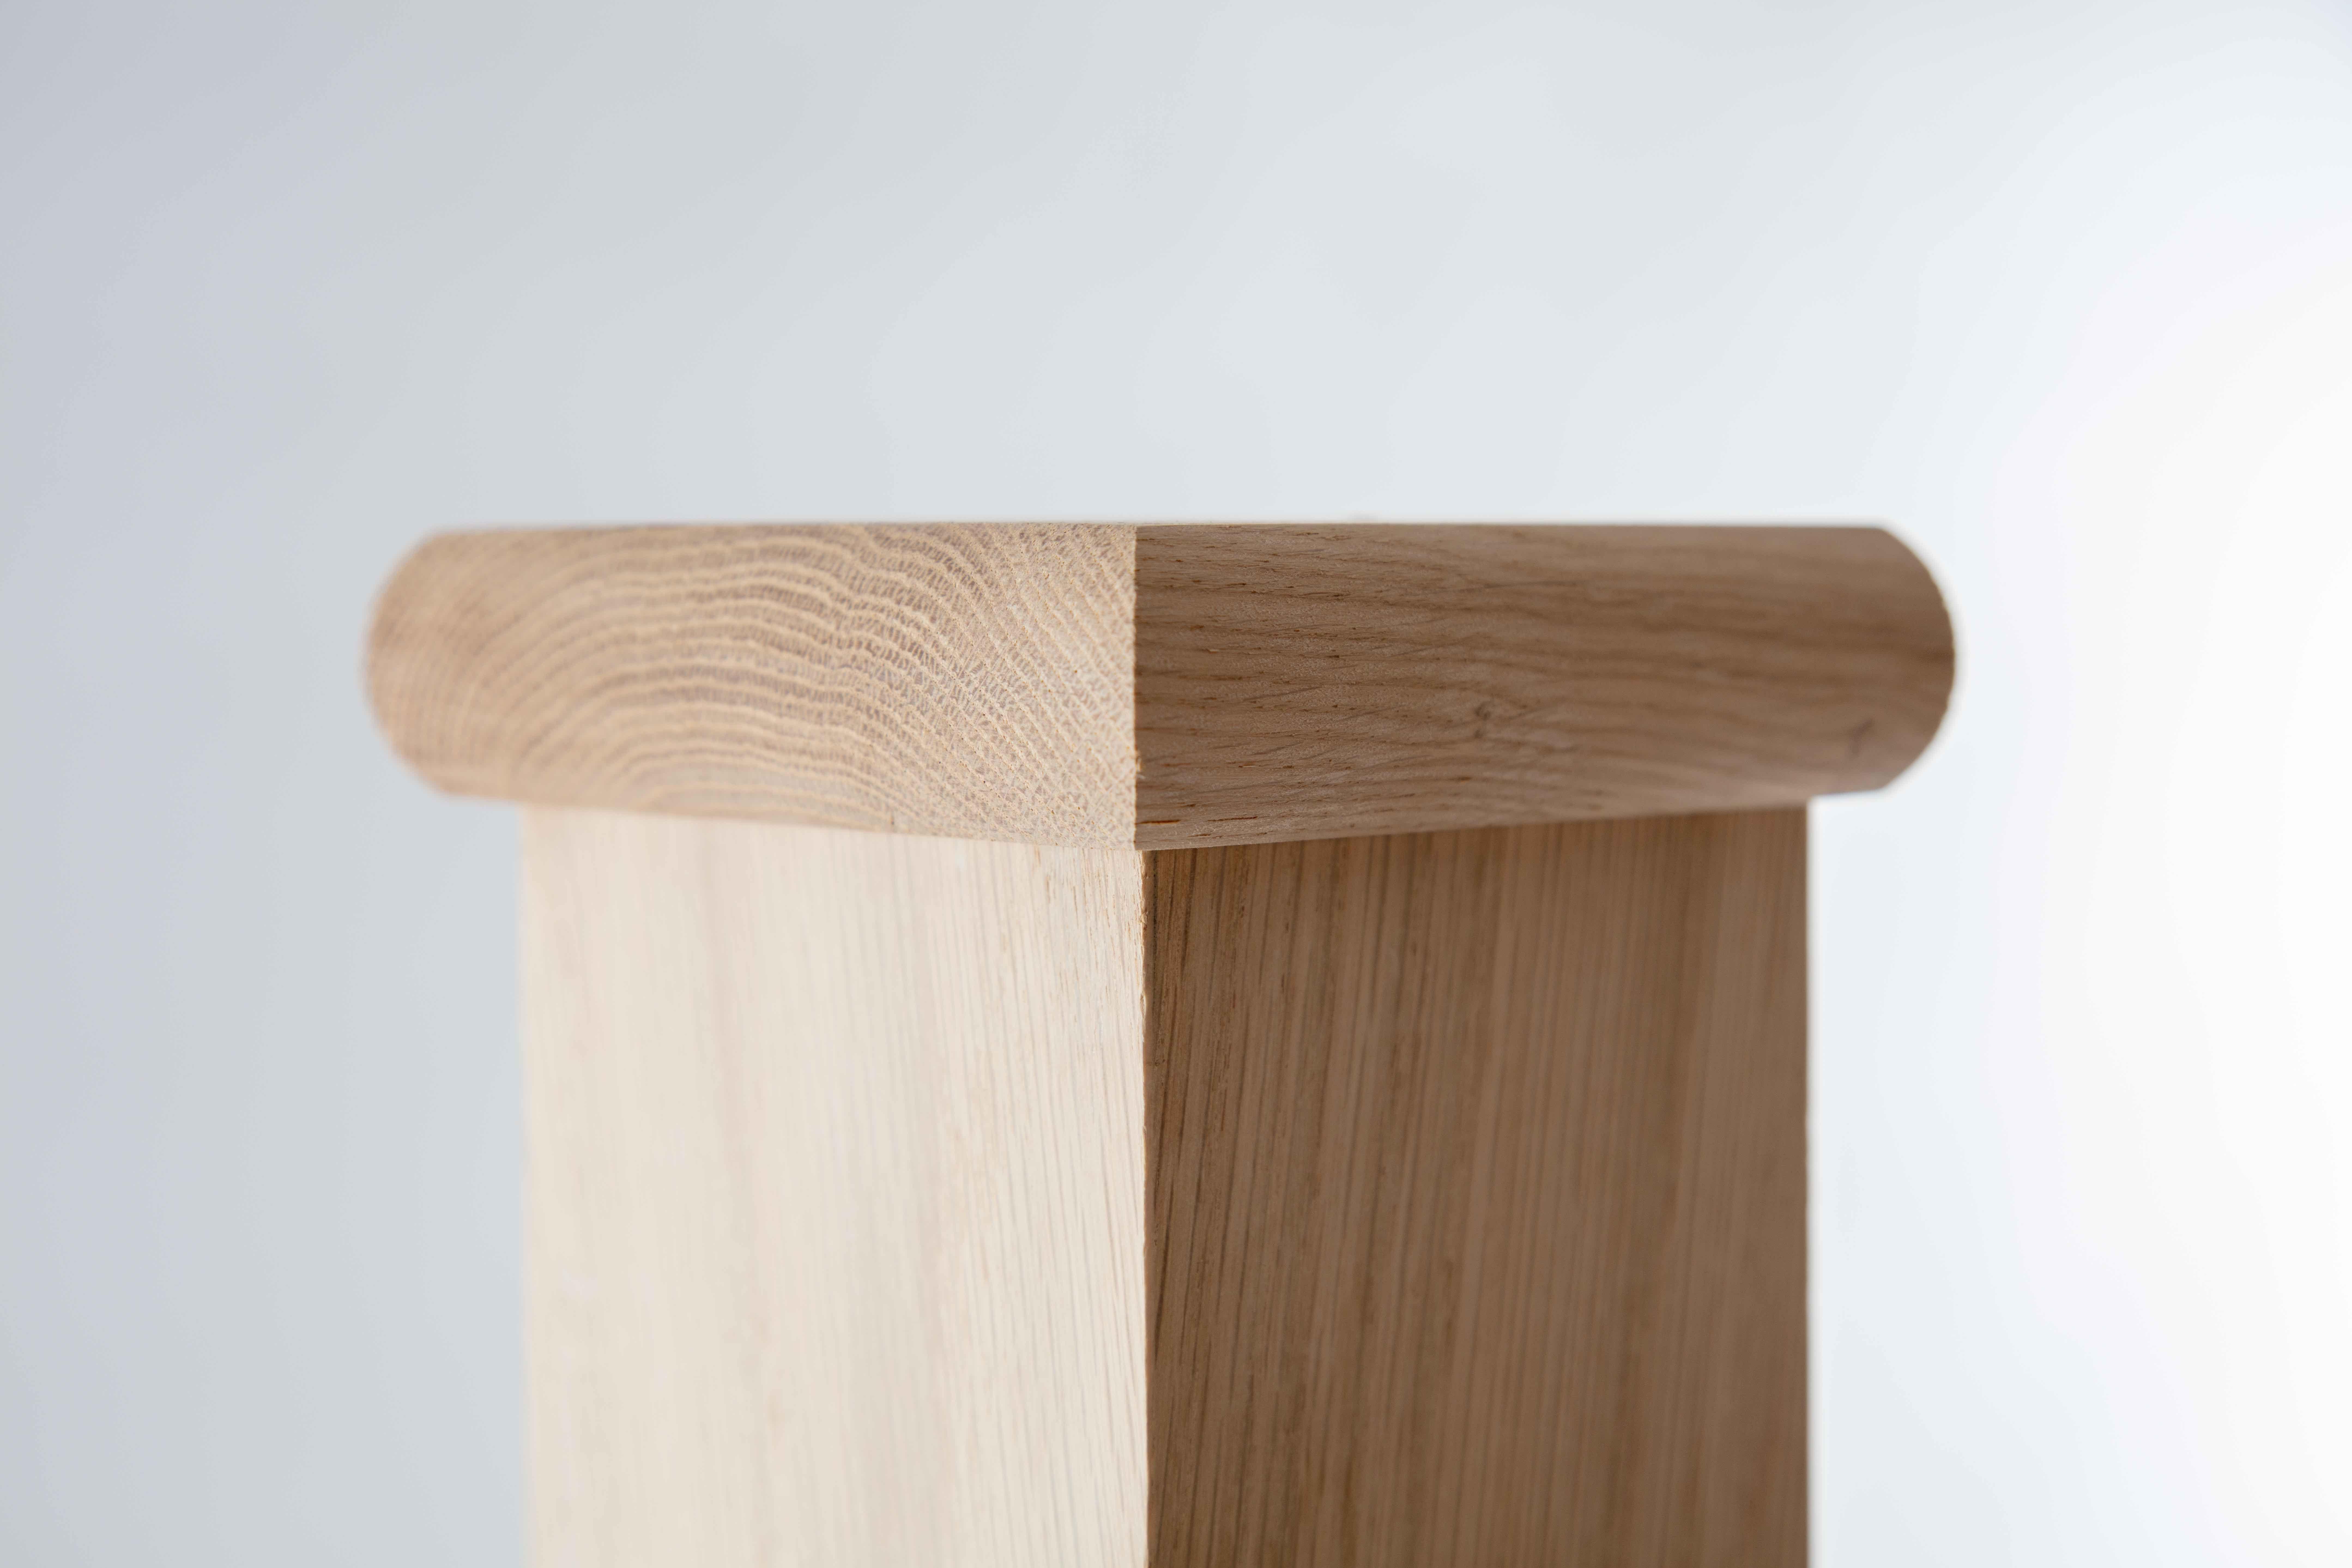 Classic Oak Square 90mm X 90mm Newel Post Fitted With Oak Flat Cap Simplicity Is Key Square Newel Post Newel Post Caps Newel Posts